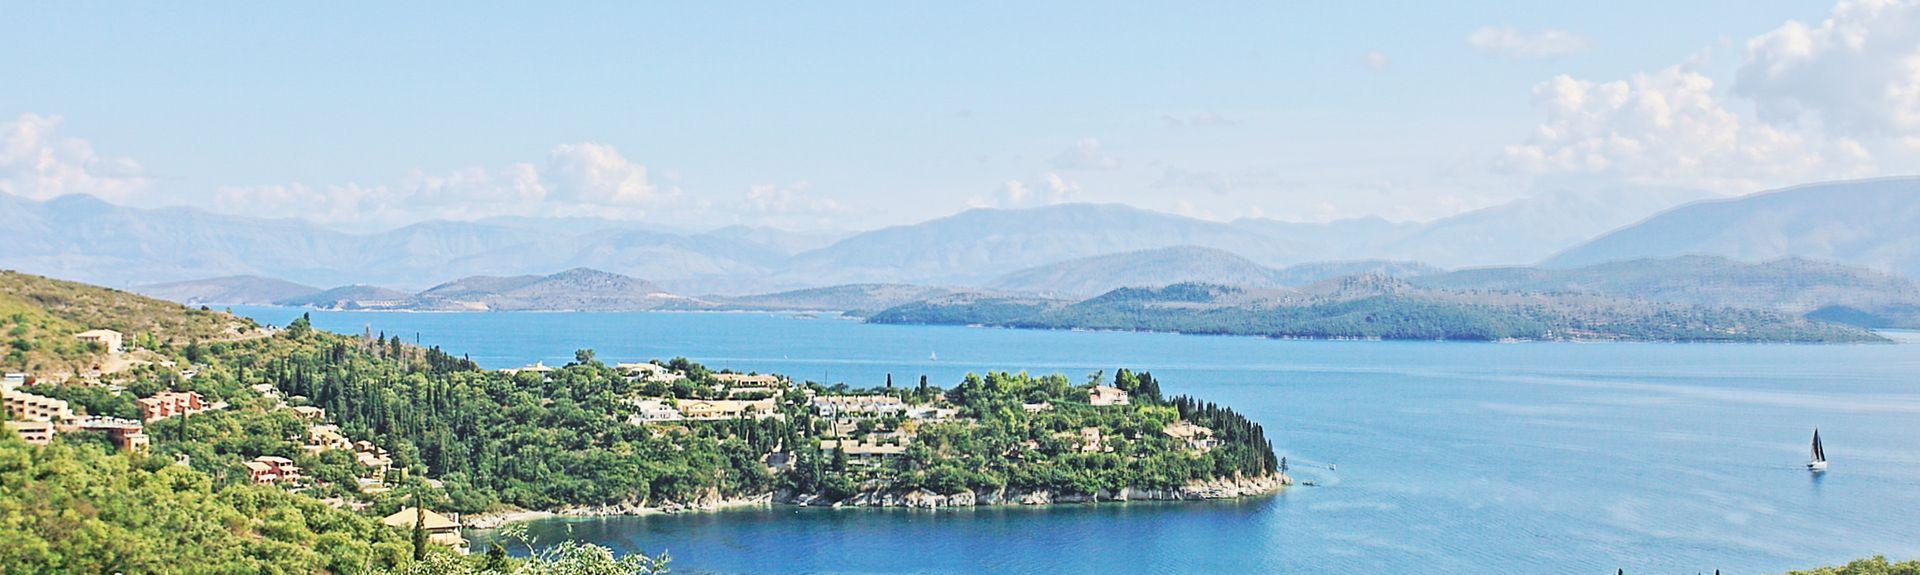 Corfu Town, Corfu, Ionian Islands Region, Greece